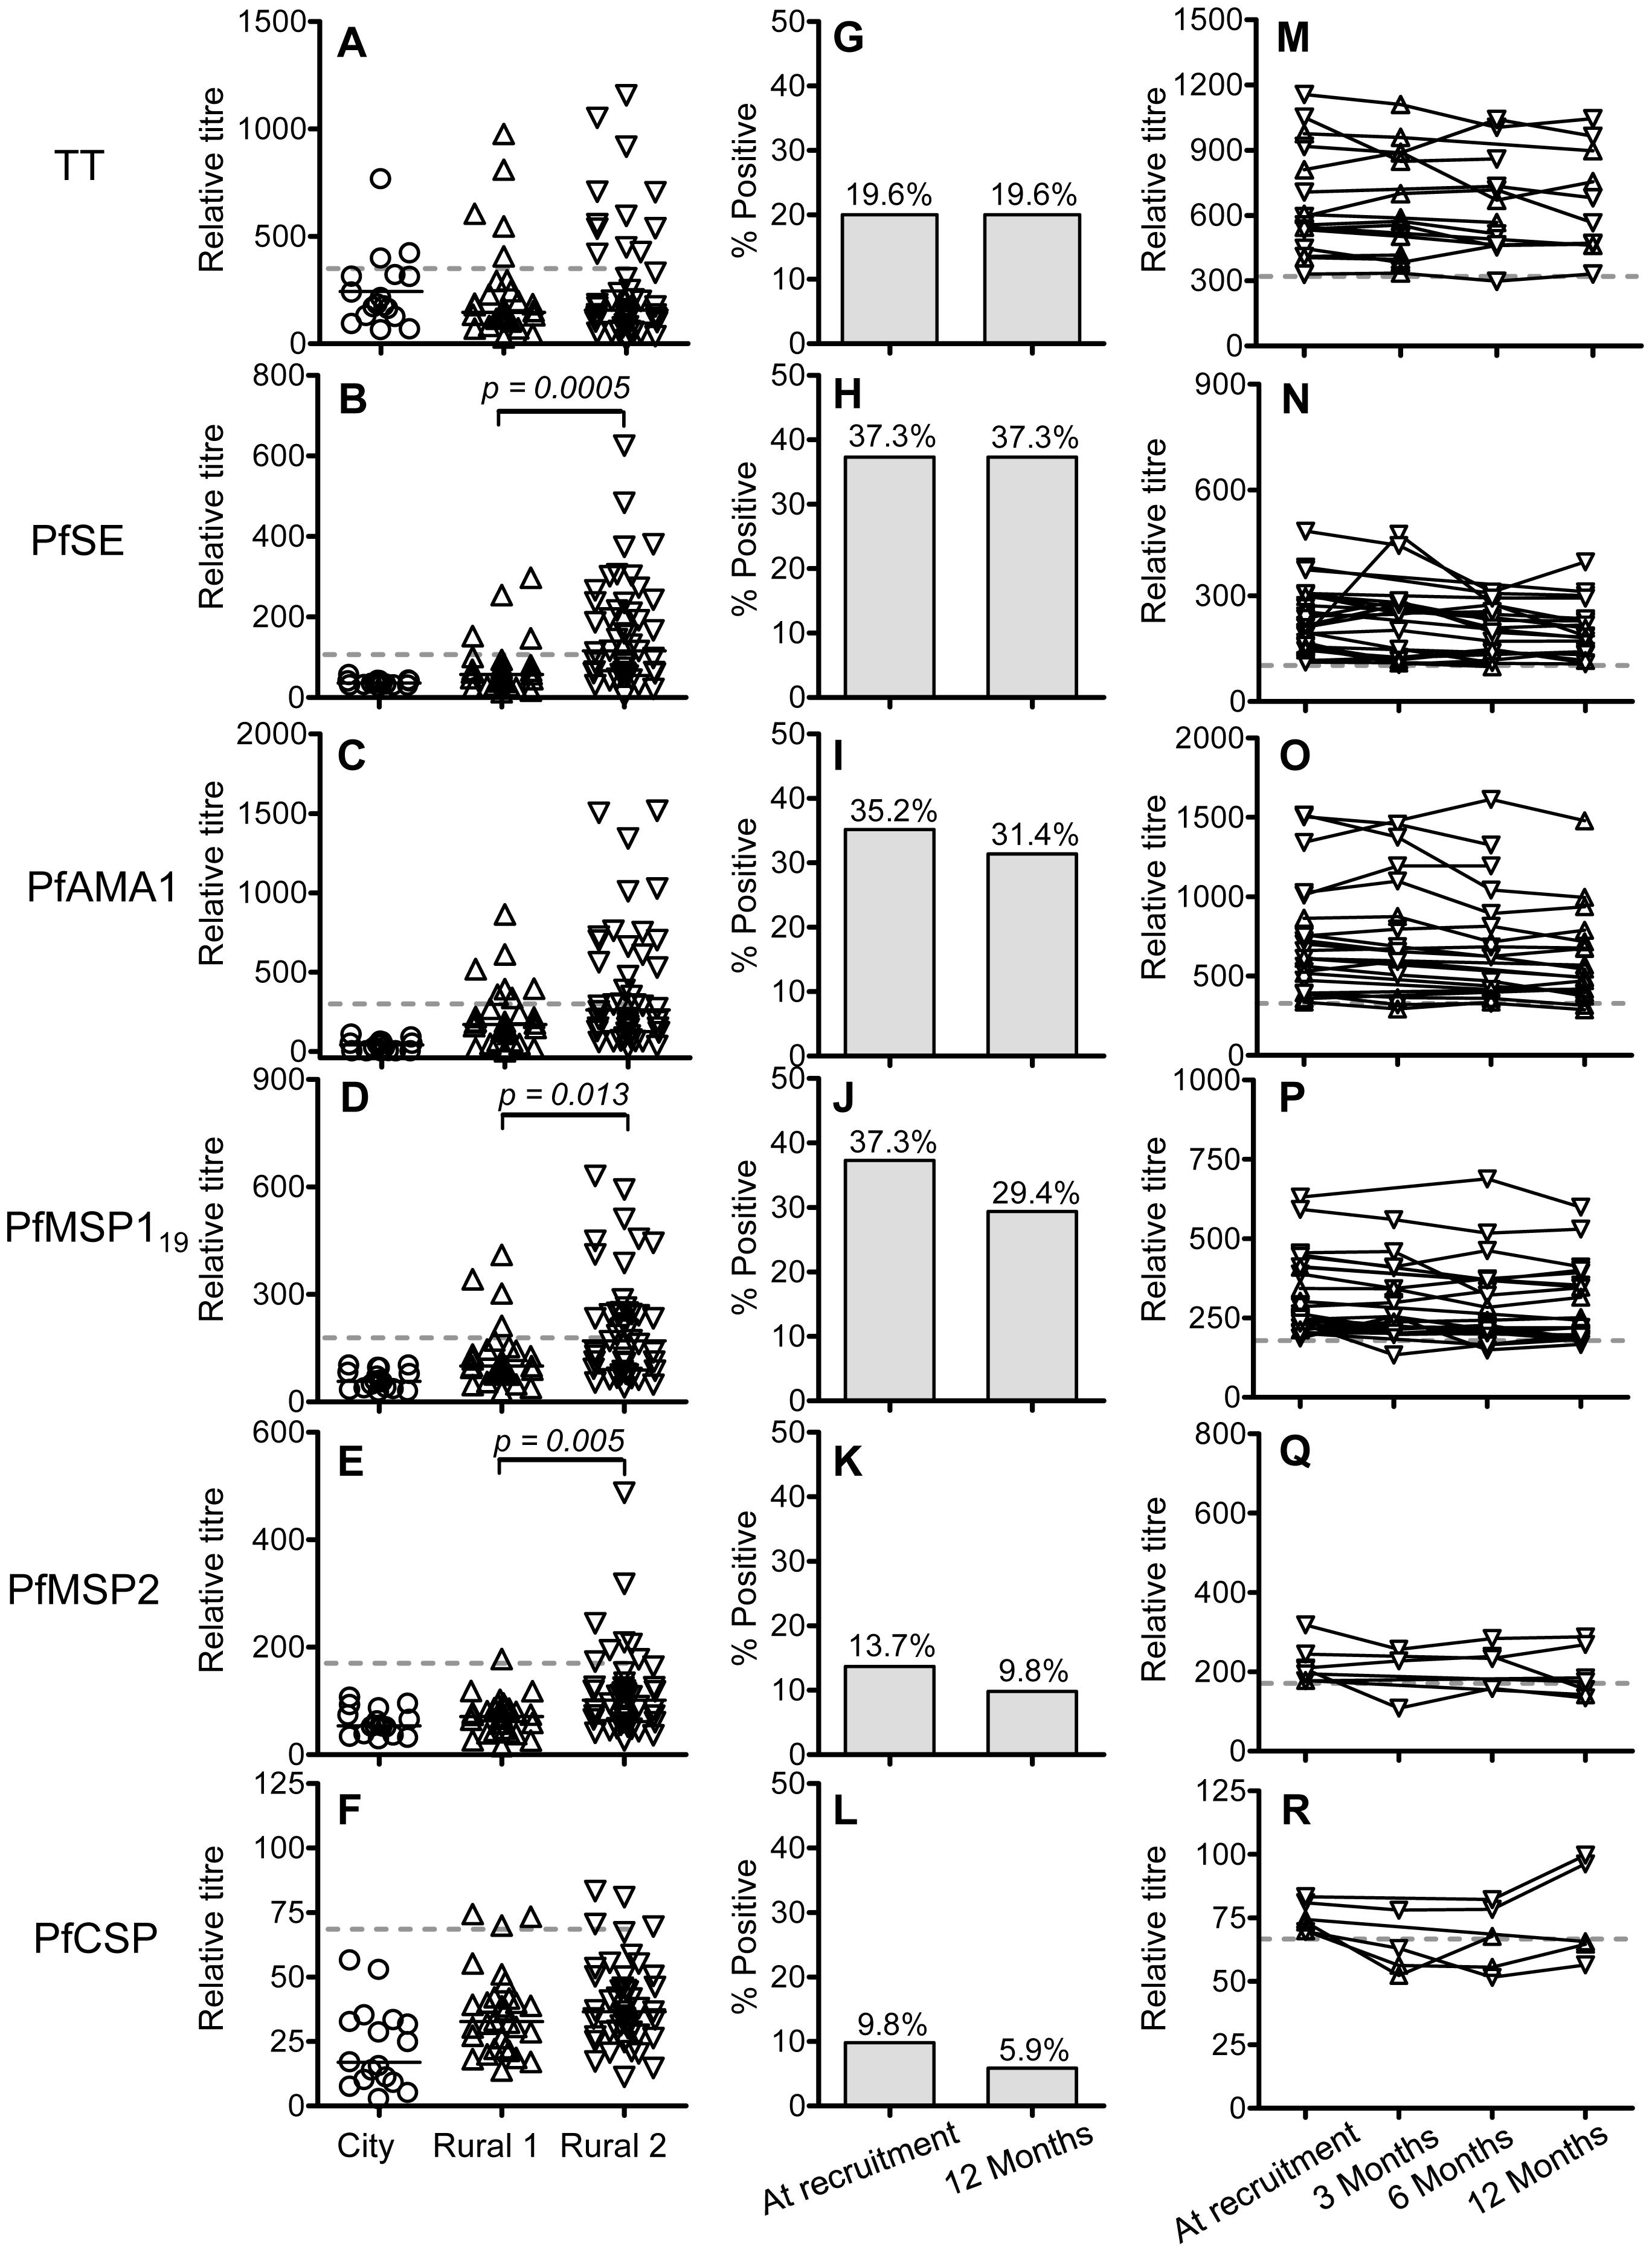 Antibody responses to <i>P. falciparum</i> antigens and tetanus toxoid.